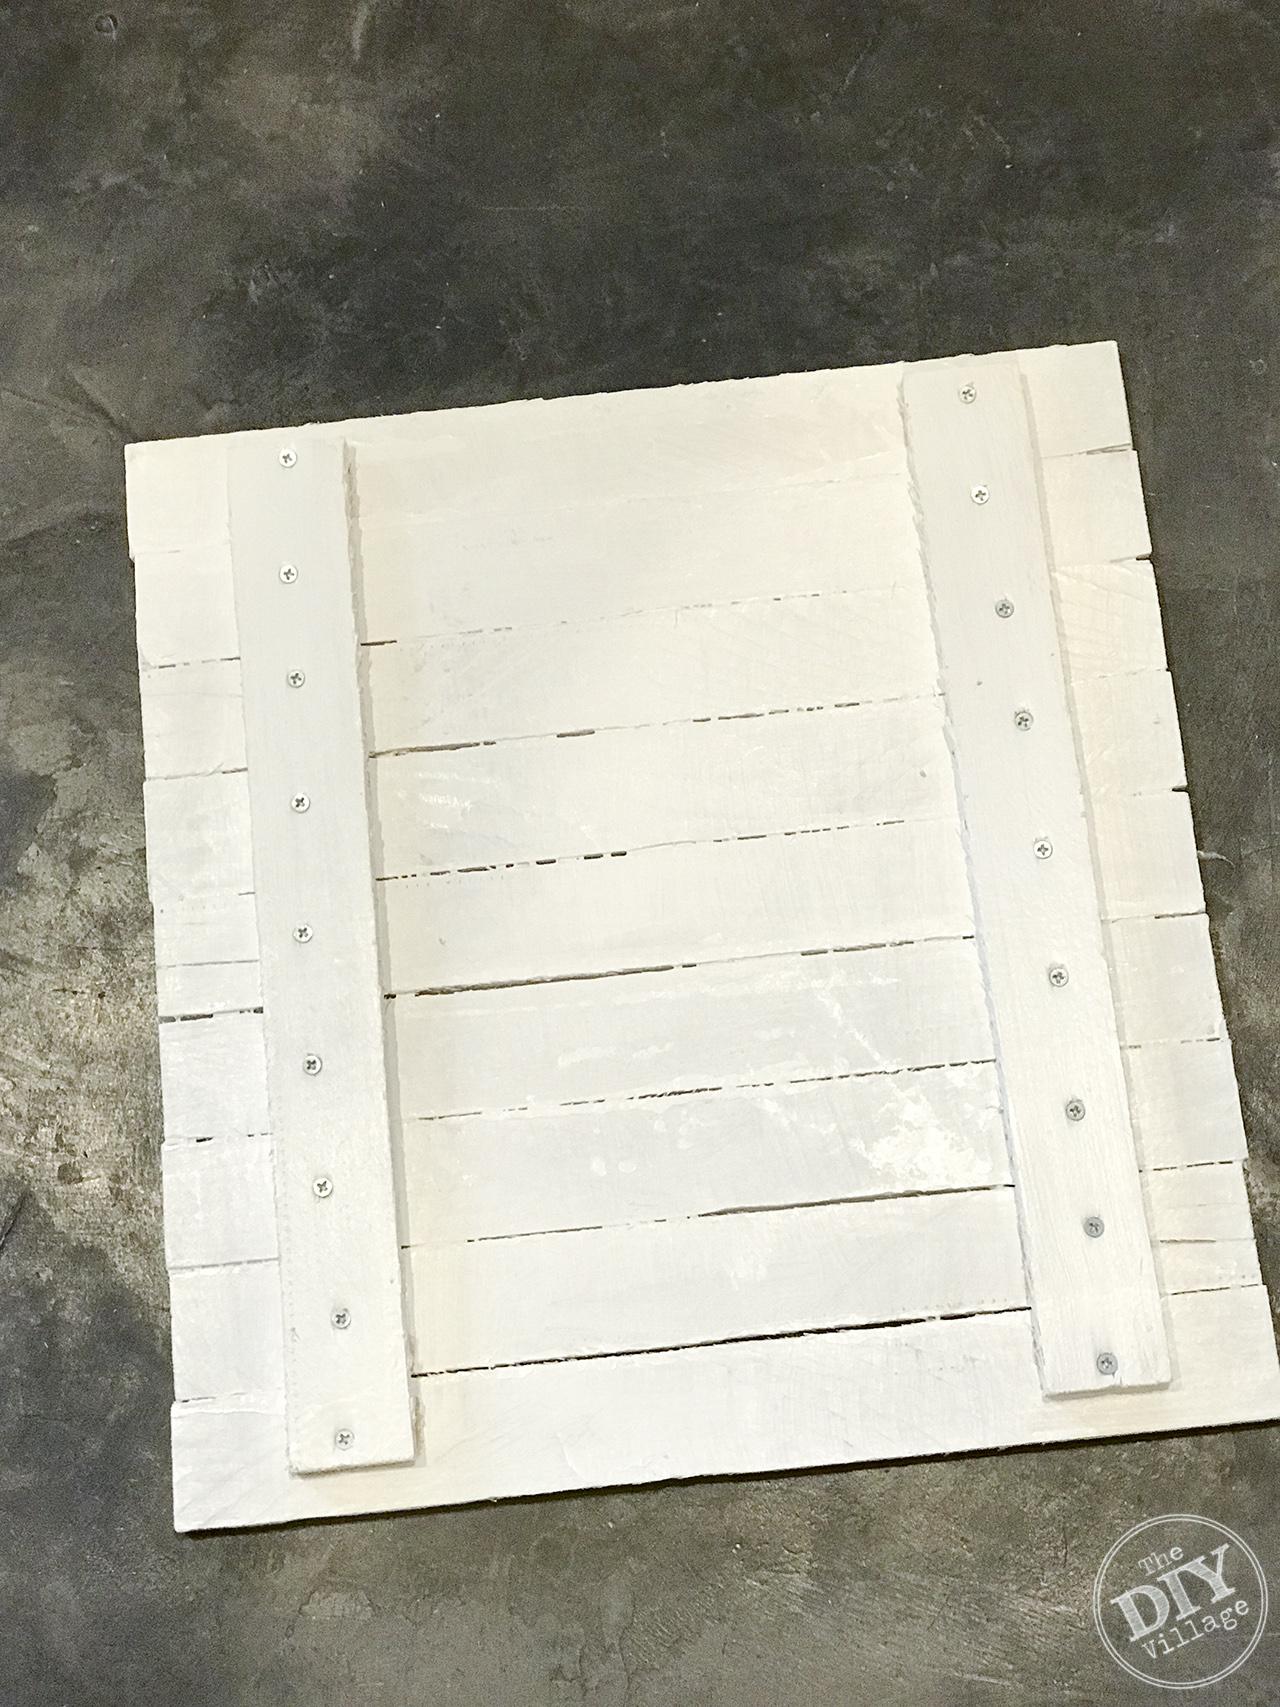 DIY Wood shim display frame - how to